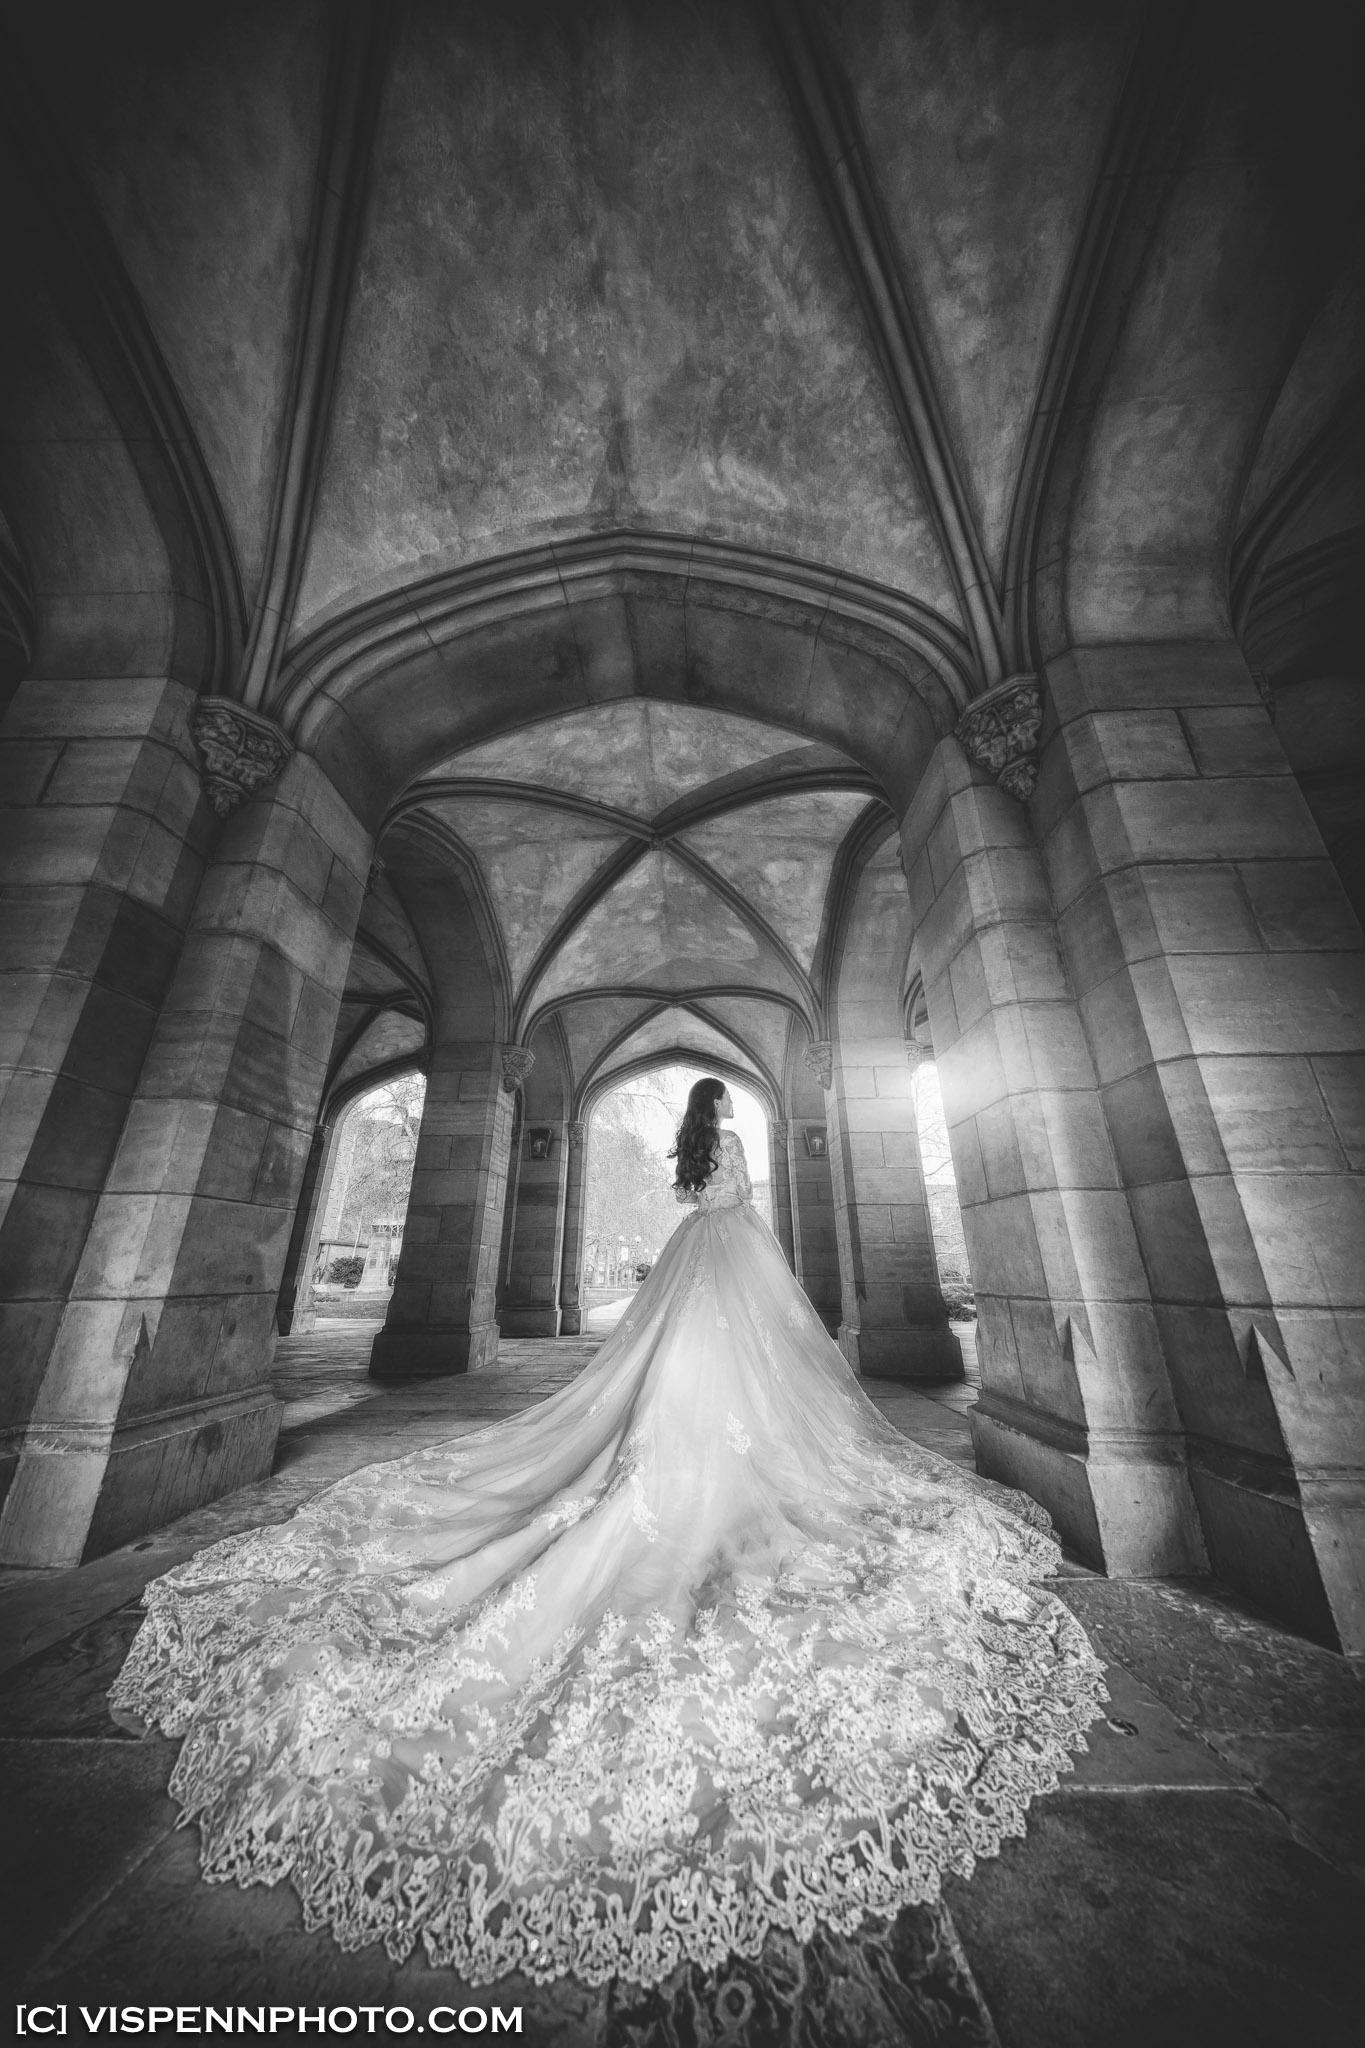 PRE WEDDING Photography Melbourne VISPENN 墨尔本 婚纱照 结婚照 婚纱摄影 VISPENN JackySerena 0753 2